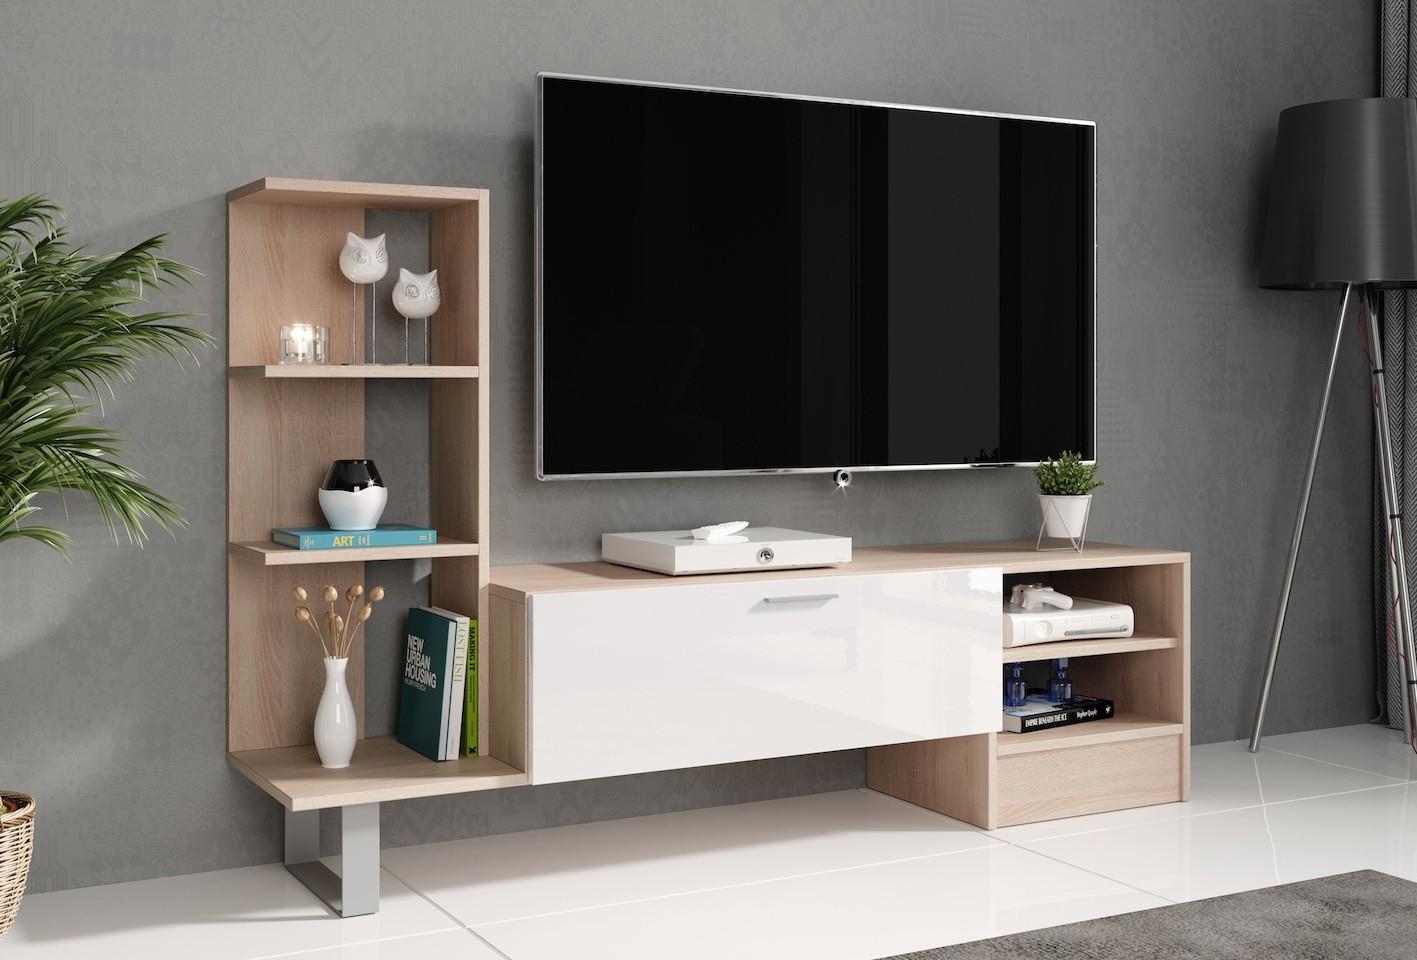 Computer En Tv Meubel.Tv Meubel Yento Licht Eiken Wit 152 Cm Meubella